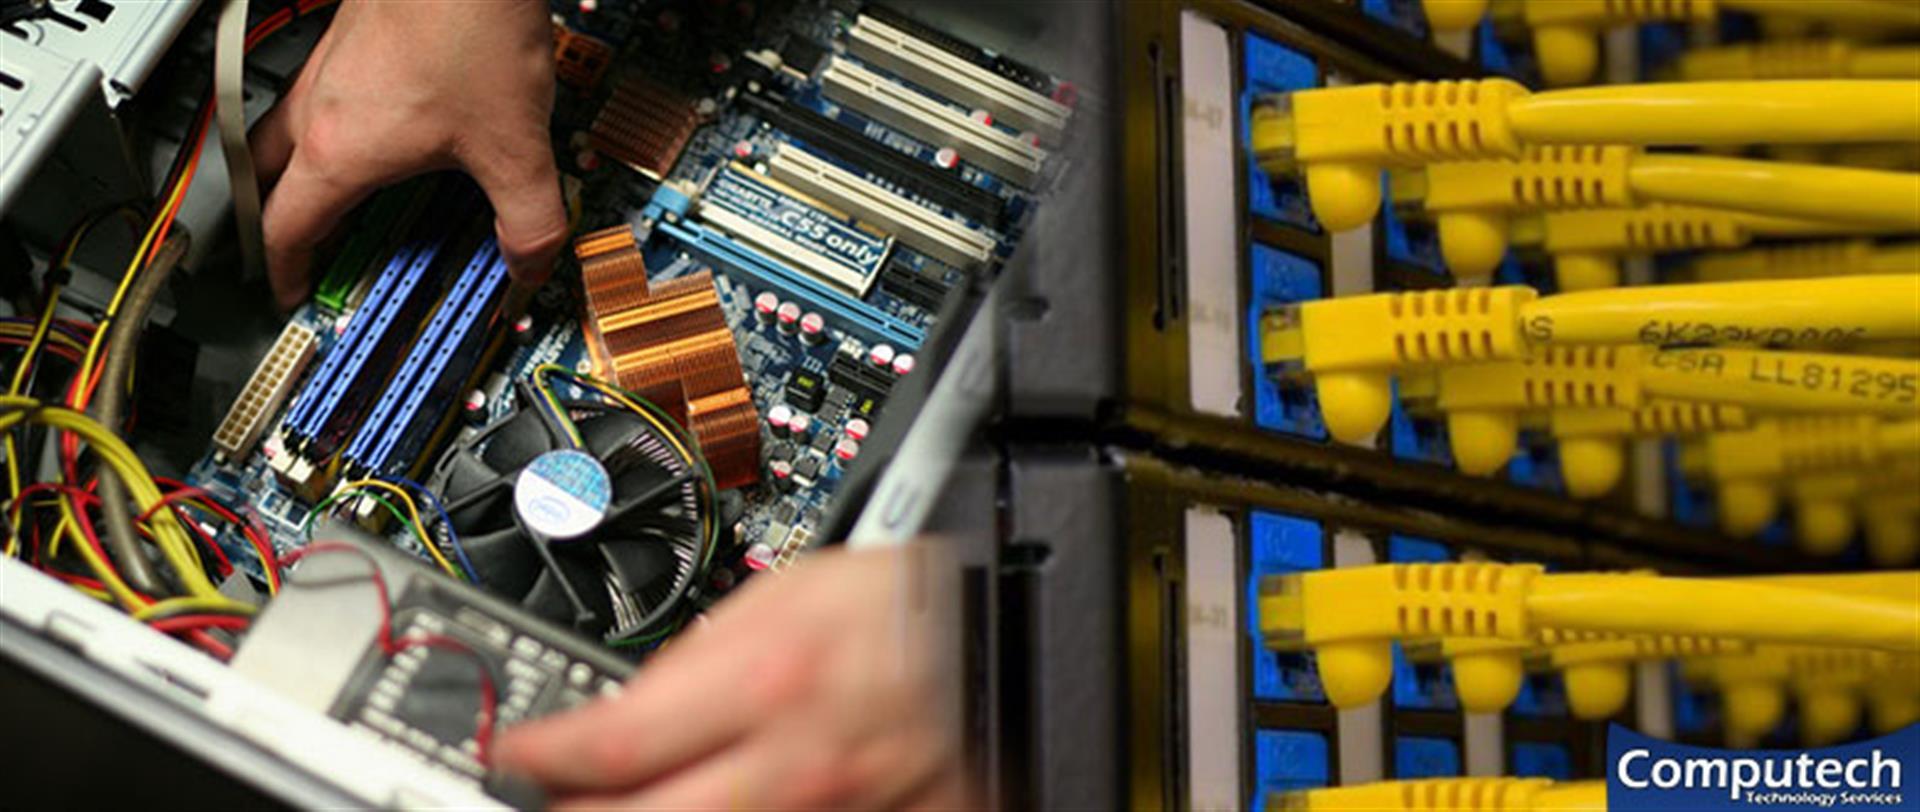 Star Valley Arizona Onsite Computer & Printer Repair, Networks, Telecom and Broadband Data Cabling Solutions